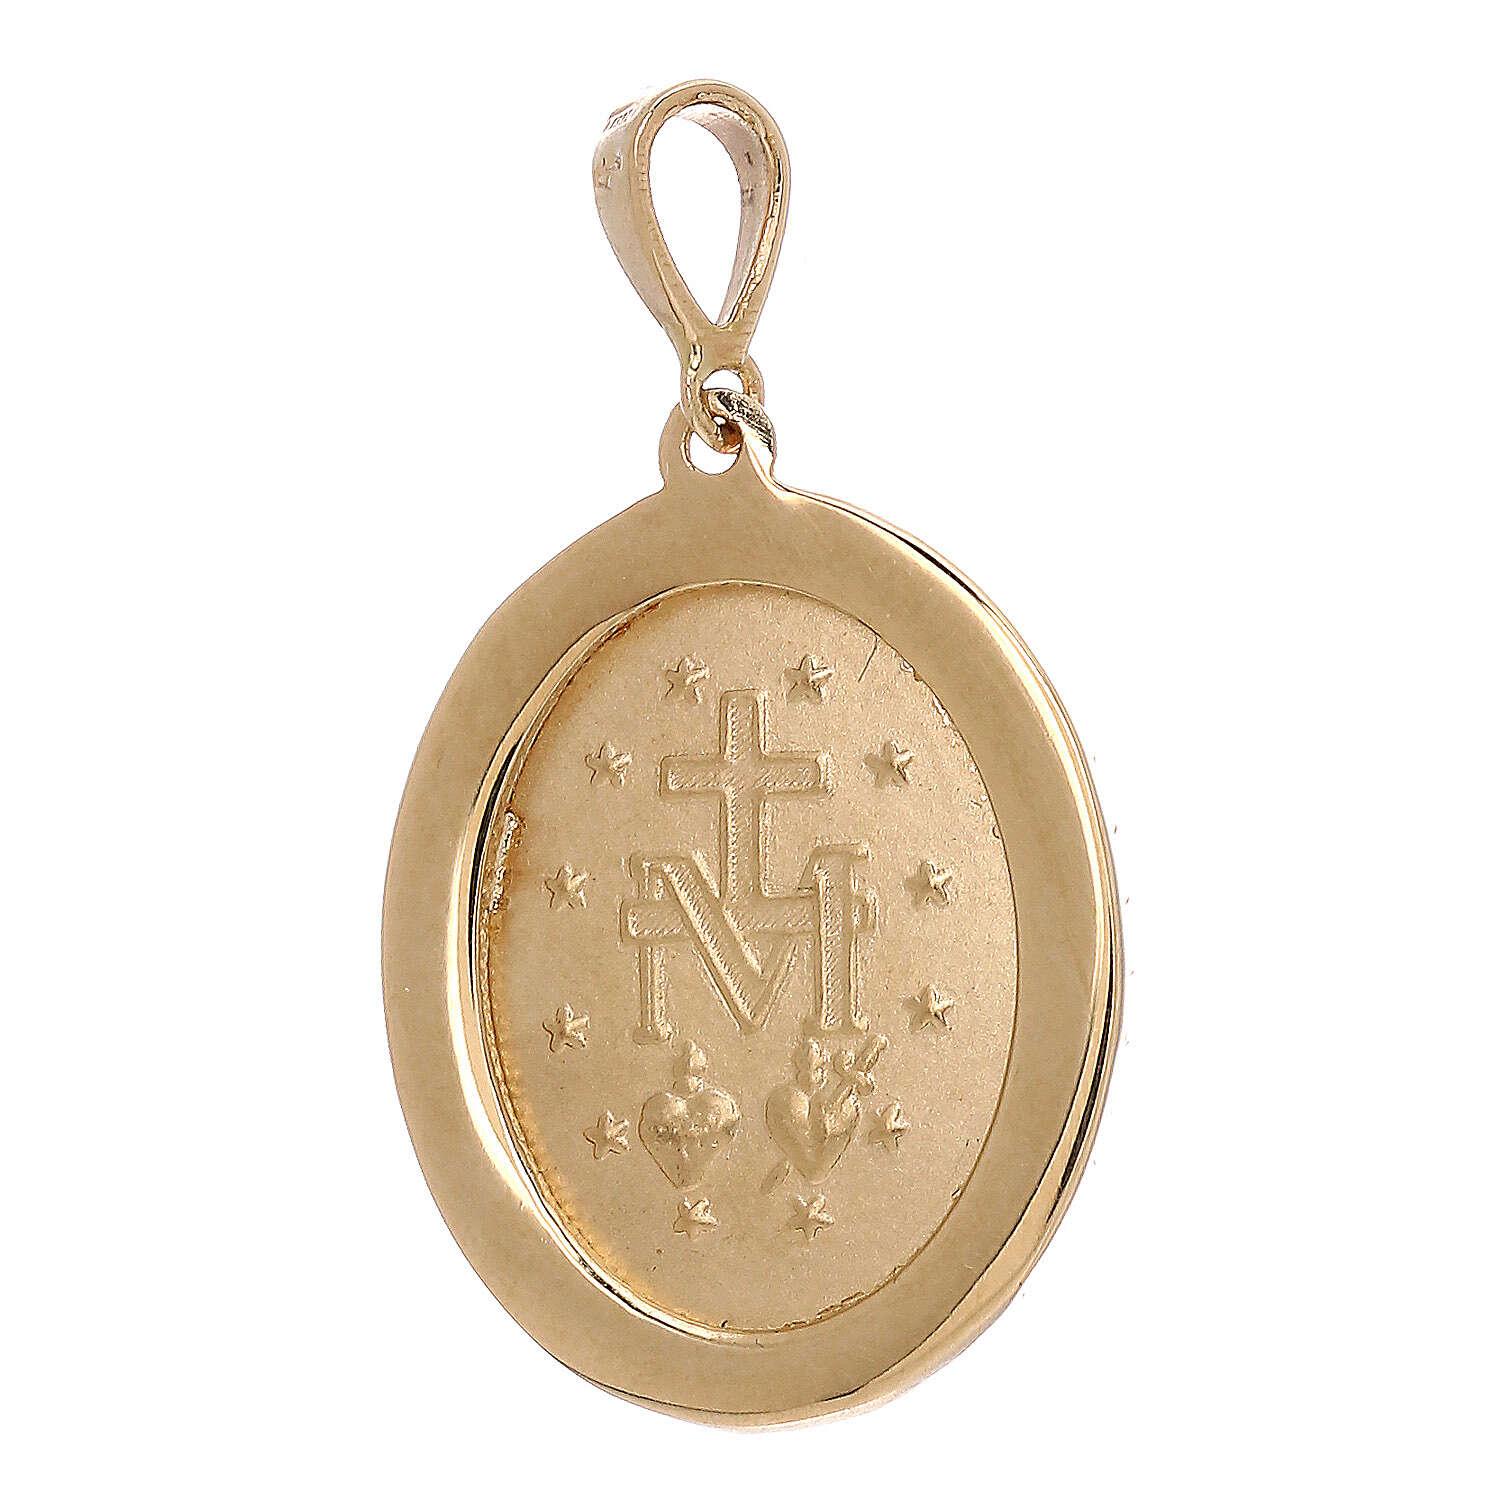 Colgante Virgen Milagrosa oro 750/00 Swarosvki verdes 3,4 gramos 4